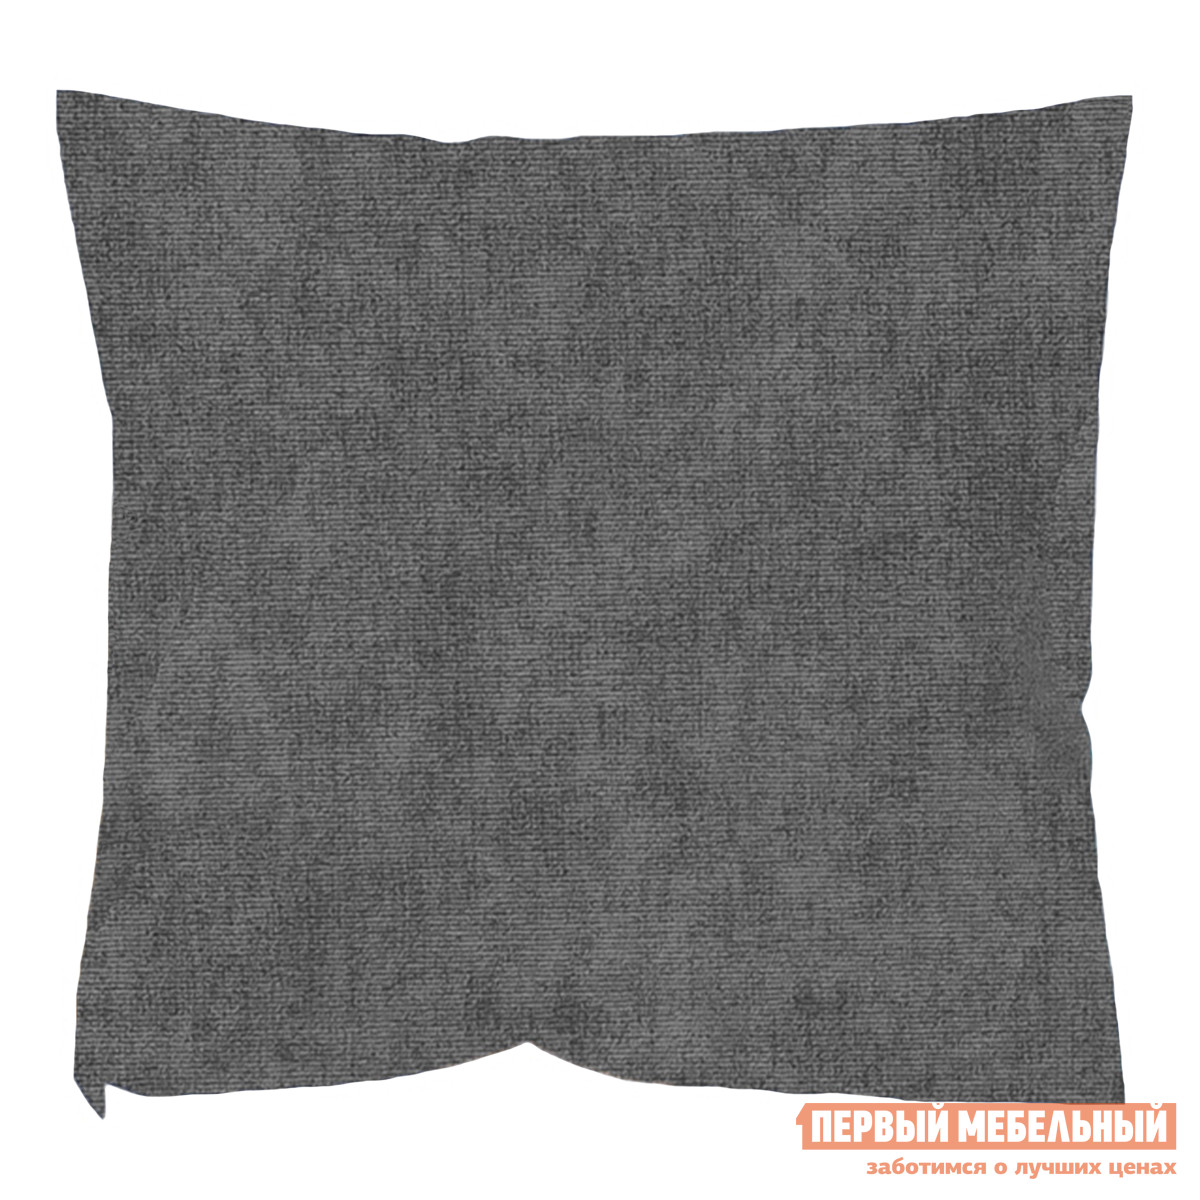 Декоративная подушка DreamBag Темно-серый Микровельвет цены онлайн